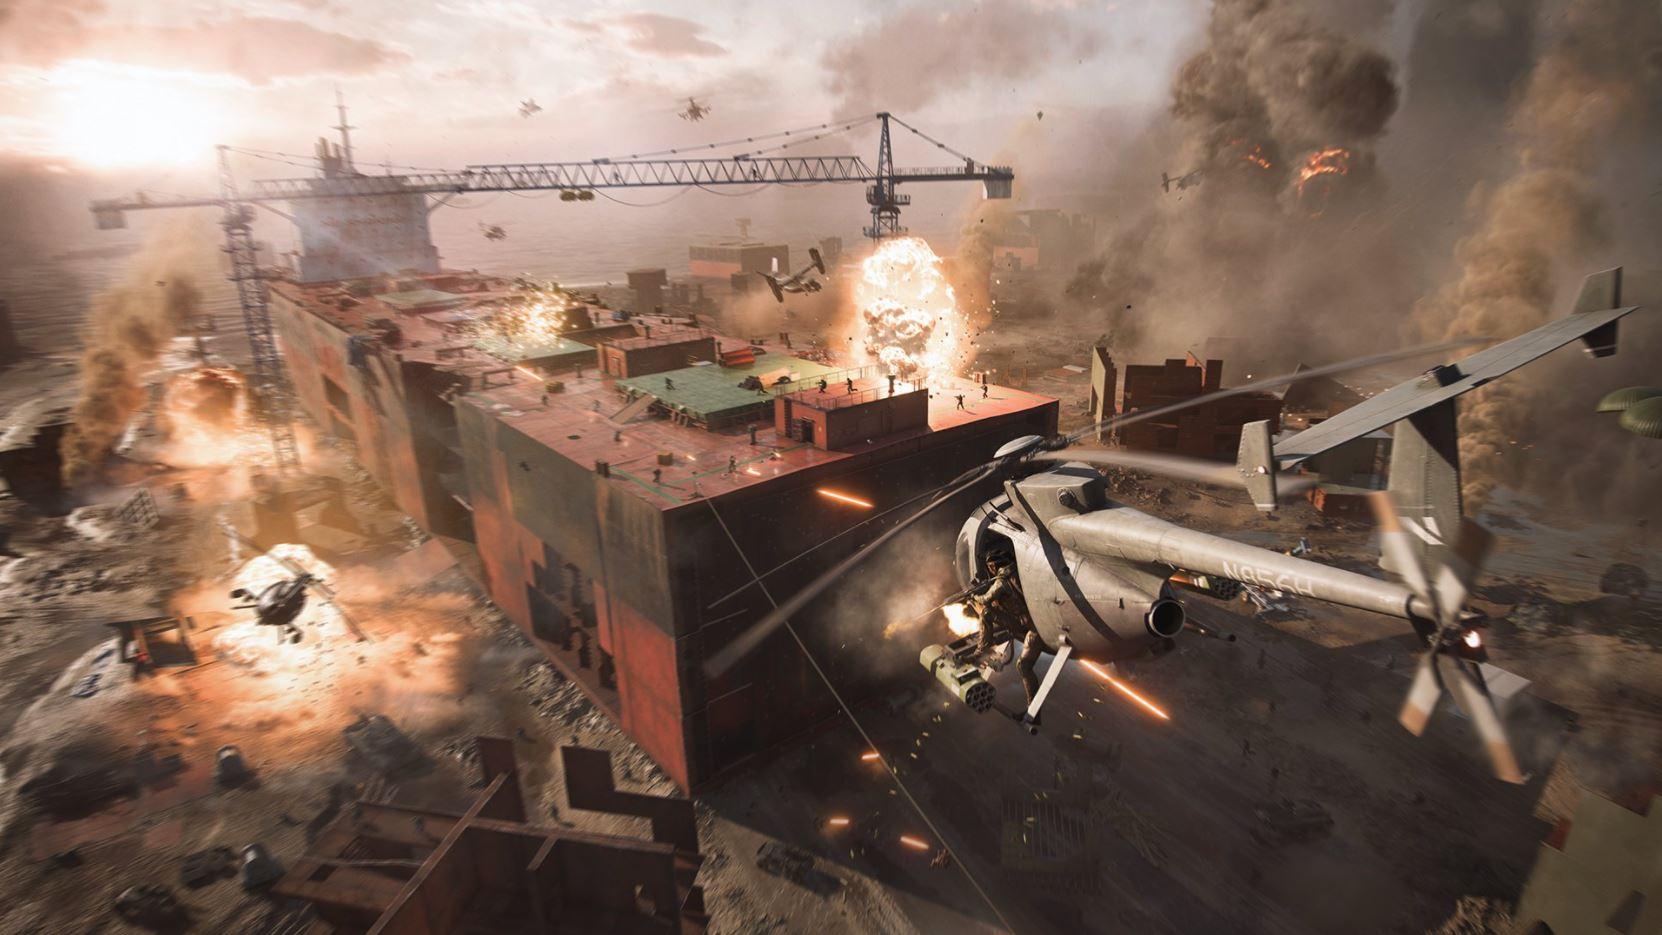 battlefield-2042-cover-art-and-screenshots-leak-on-origin-ahead-of-reveal-2